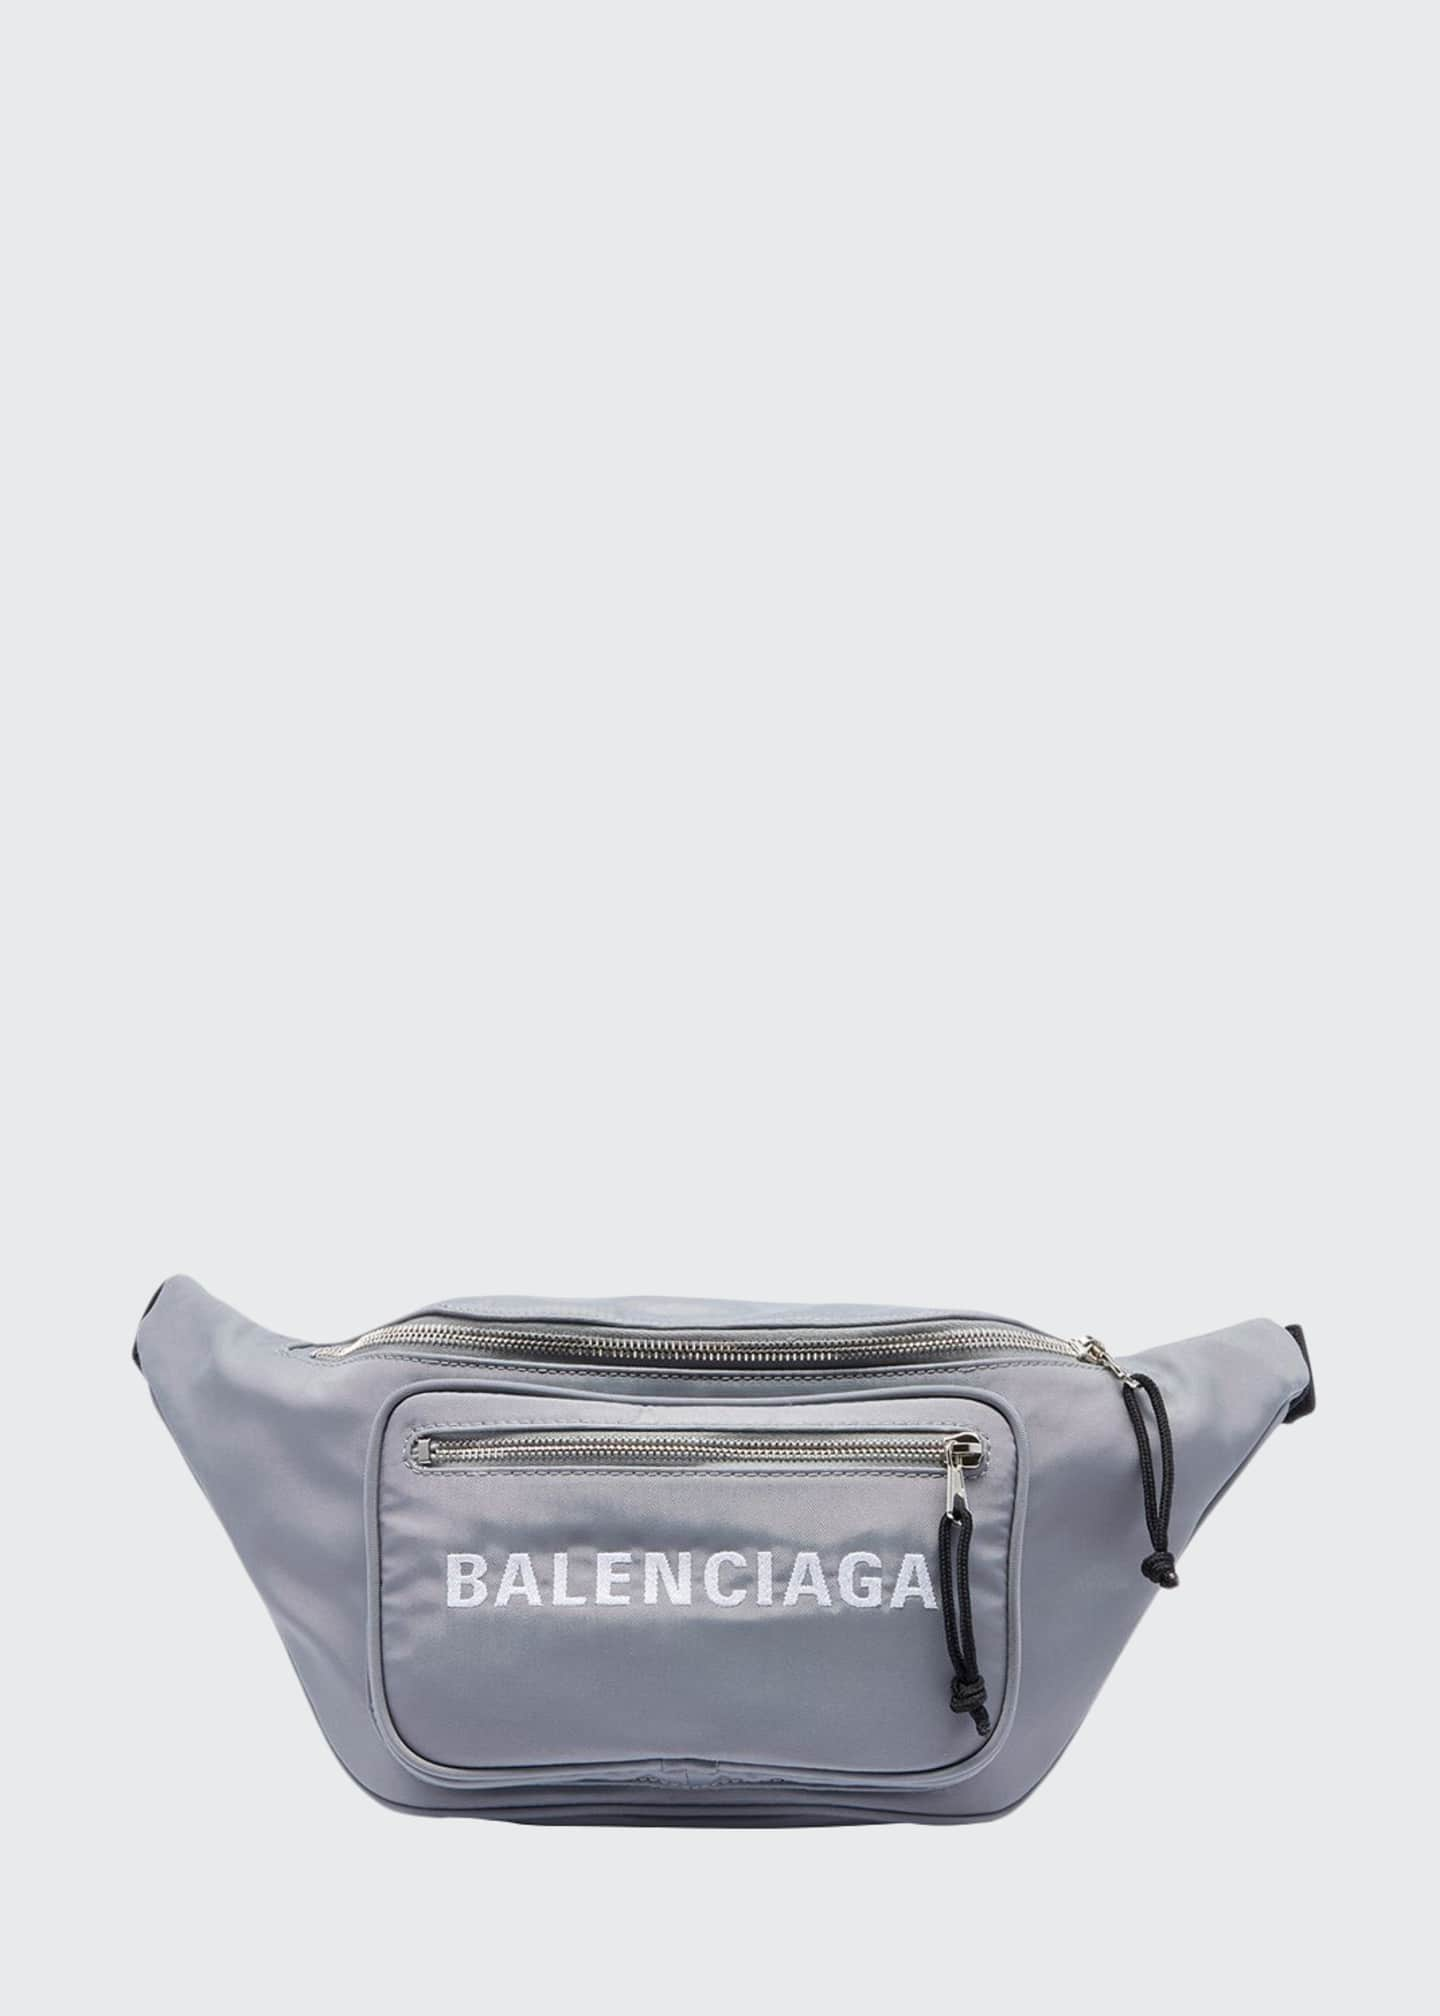 Balenciaga Wheel Canvas Belt Fanny Pack Bag with